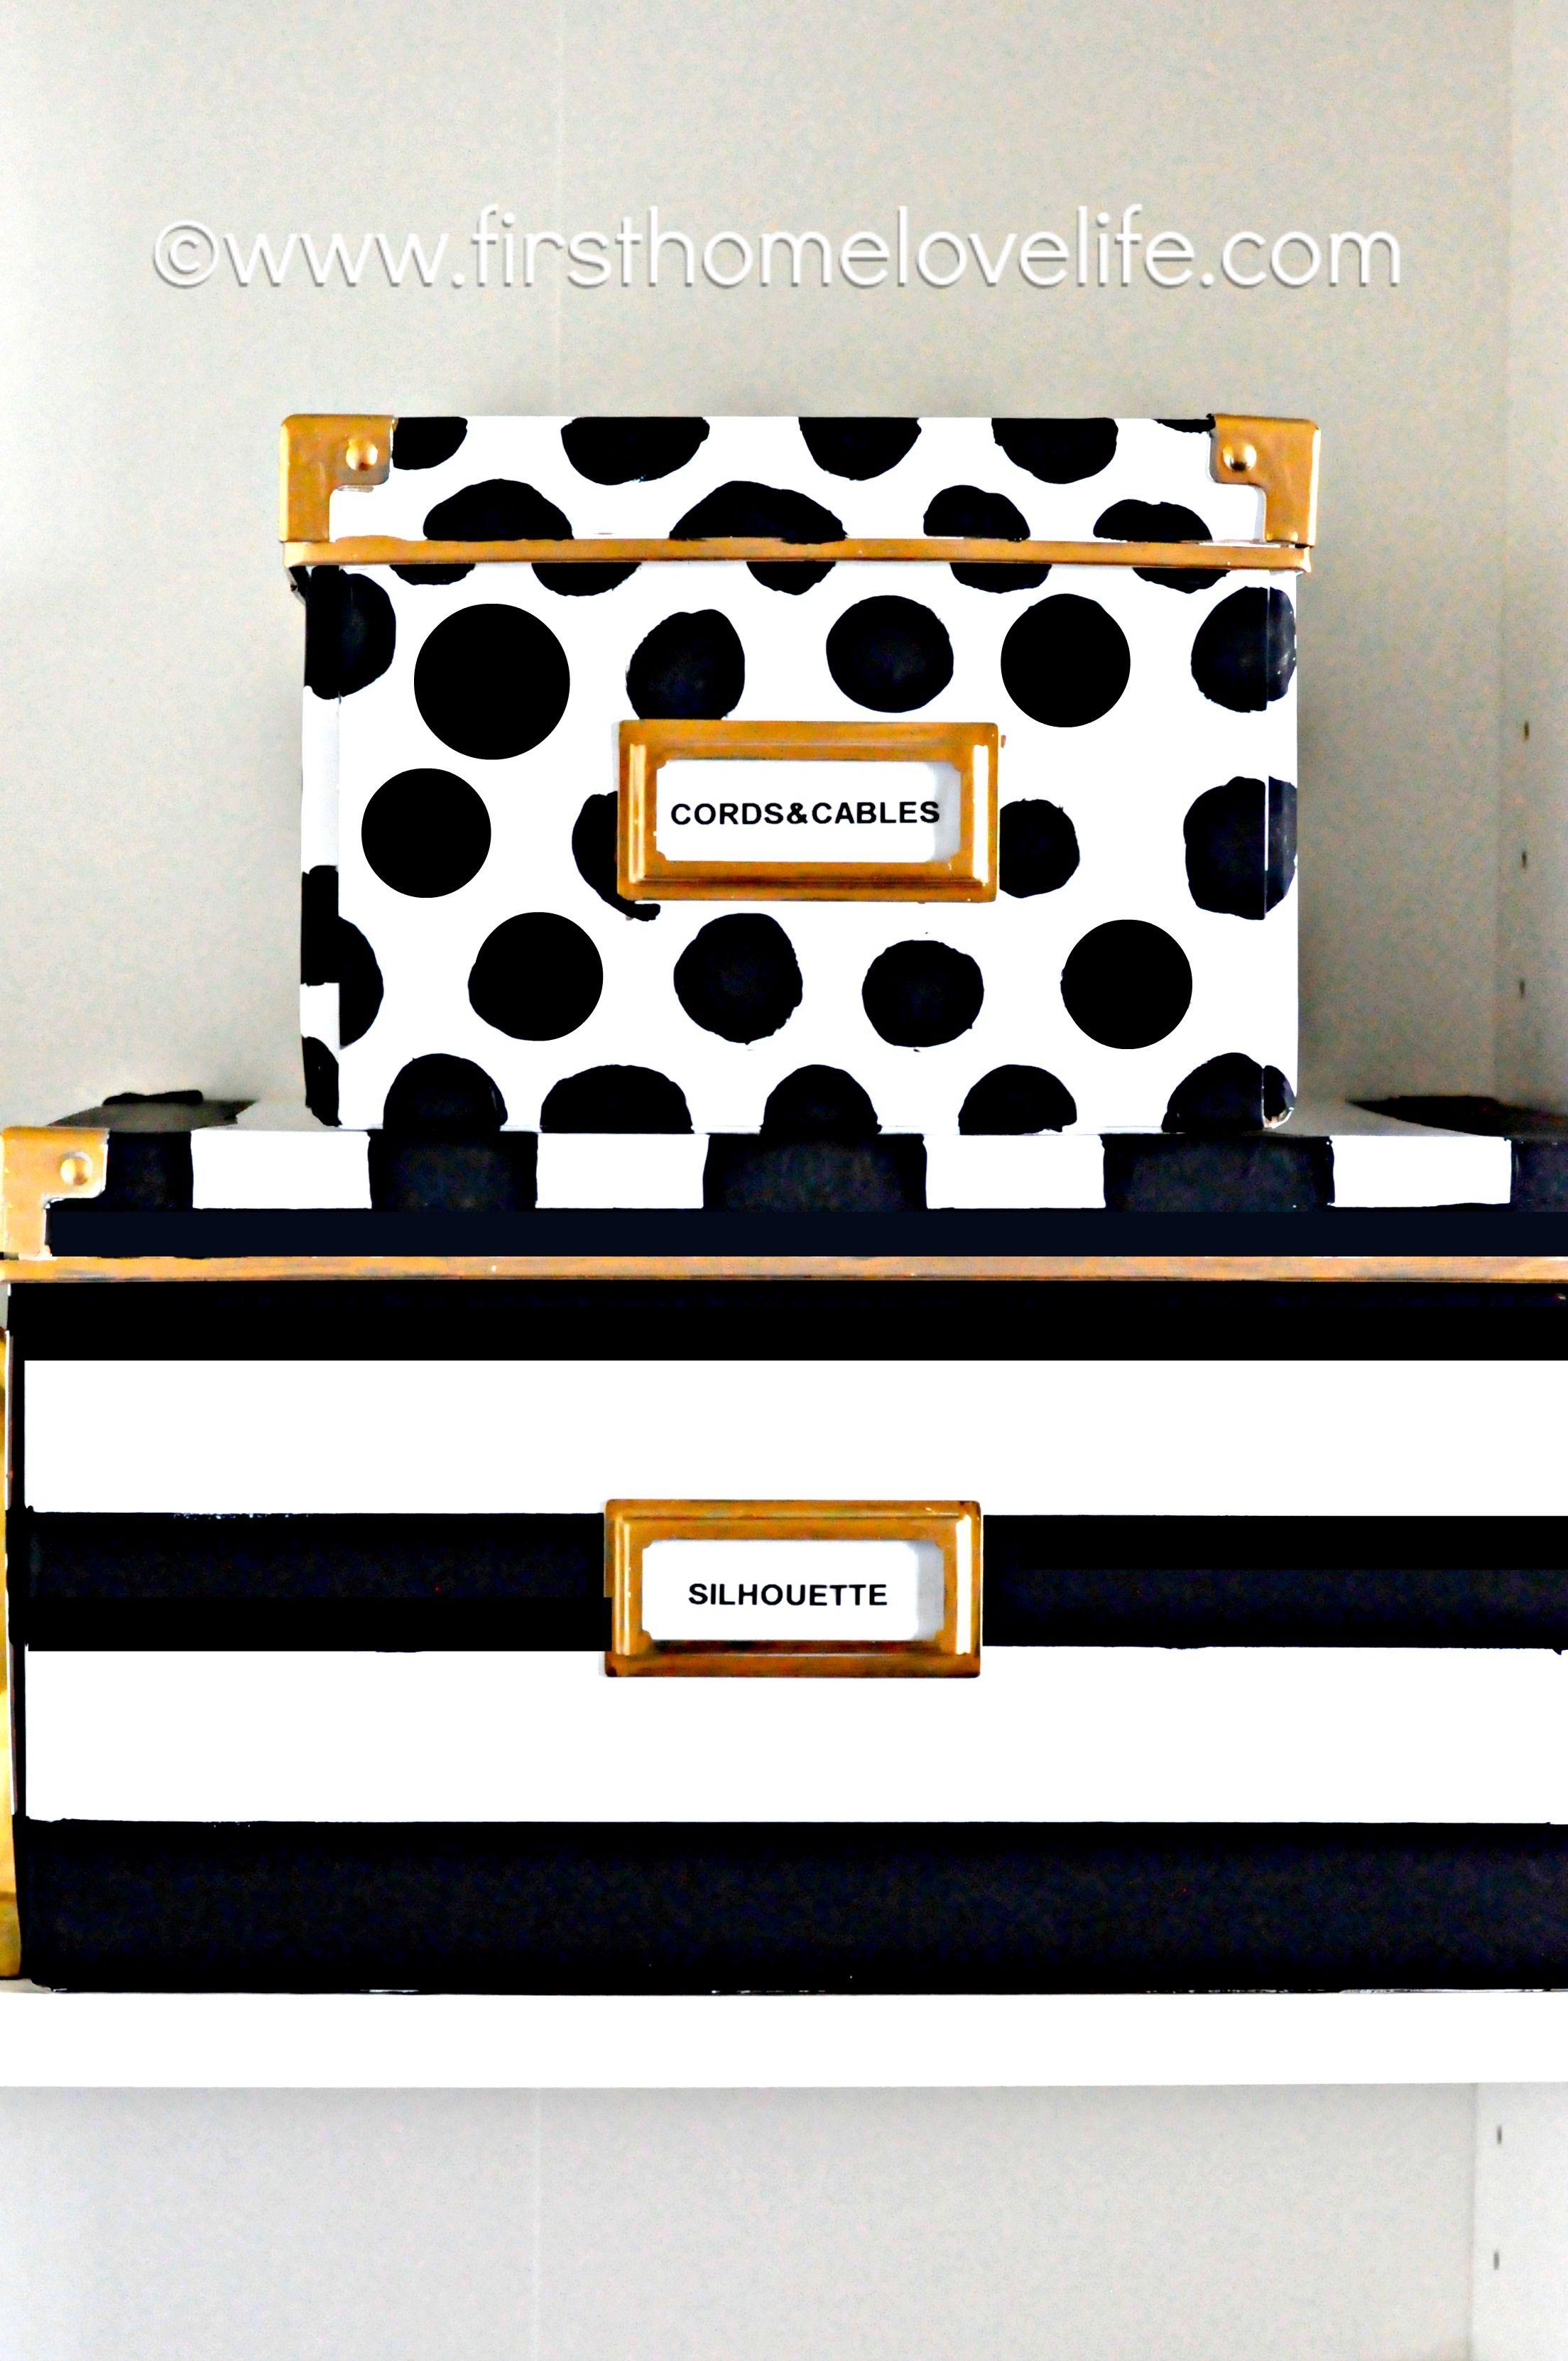 Diy Storage Container Ideas Kate Spade Inspired Storage Boxes Box Storage Boxes And Storage